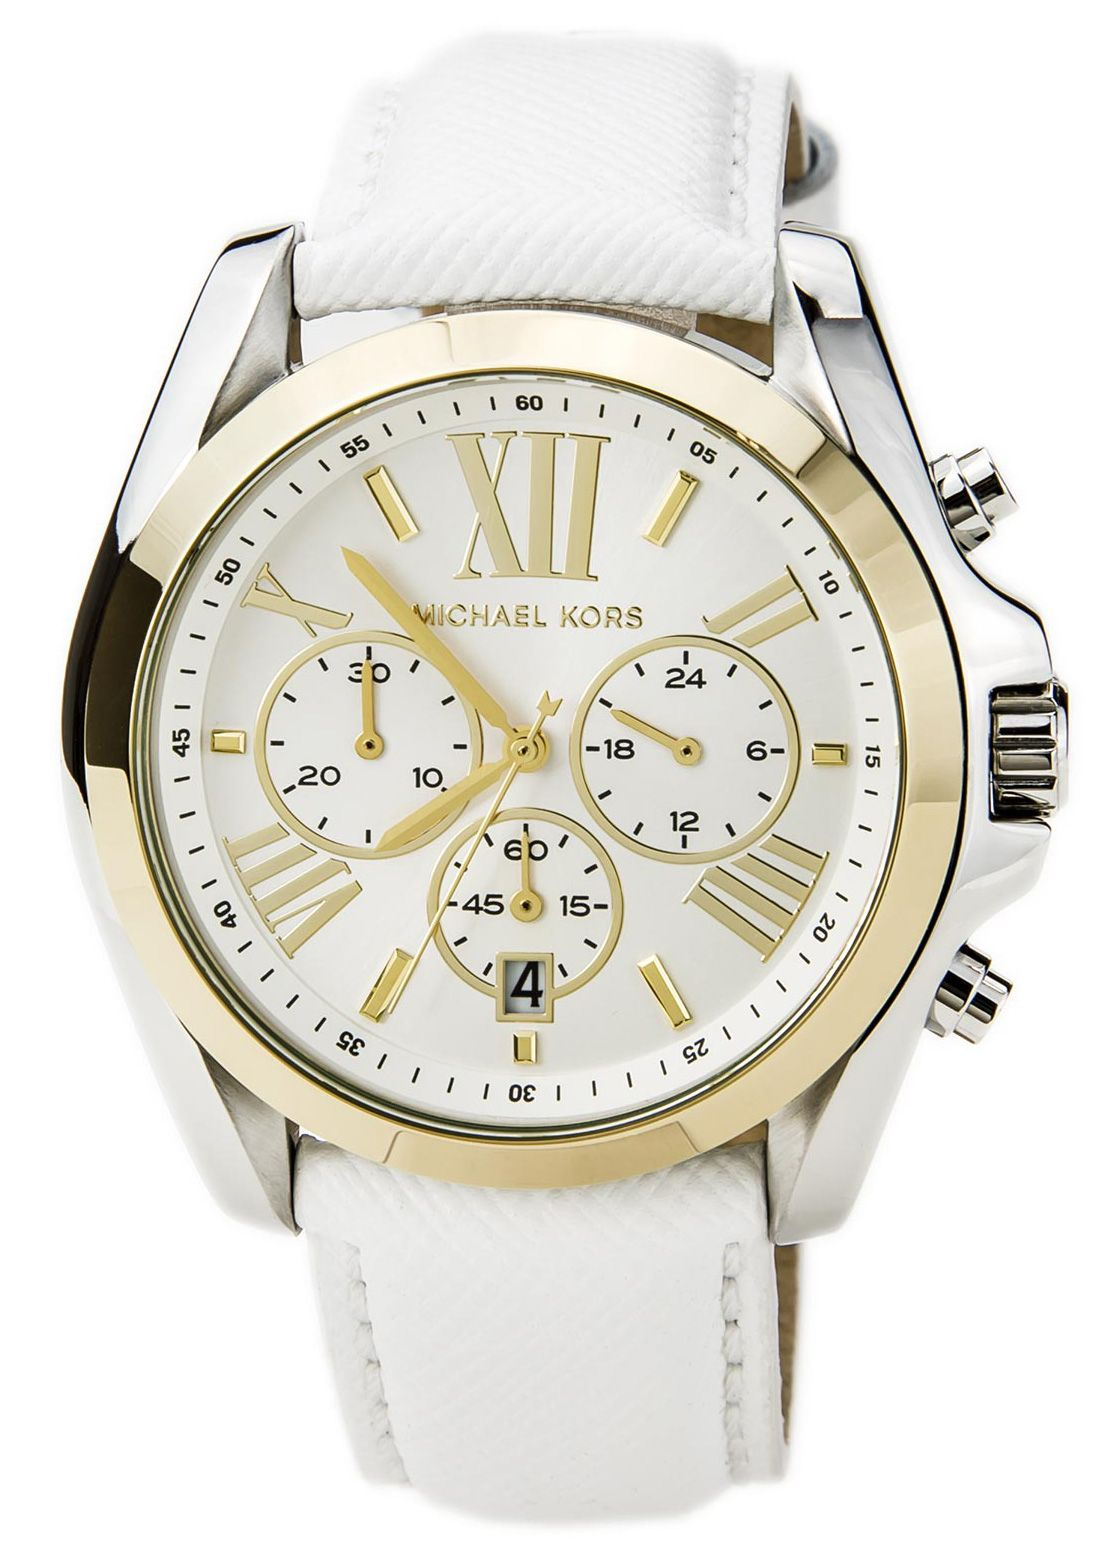 Michael Kors Ladies Bradshaw Watch MK2282 £209.00 This beautiful ...